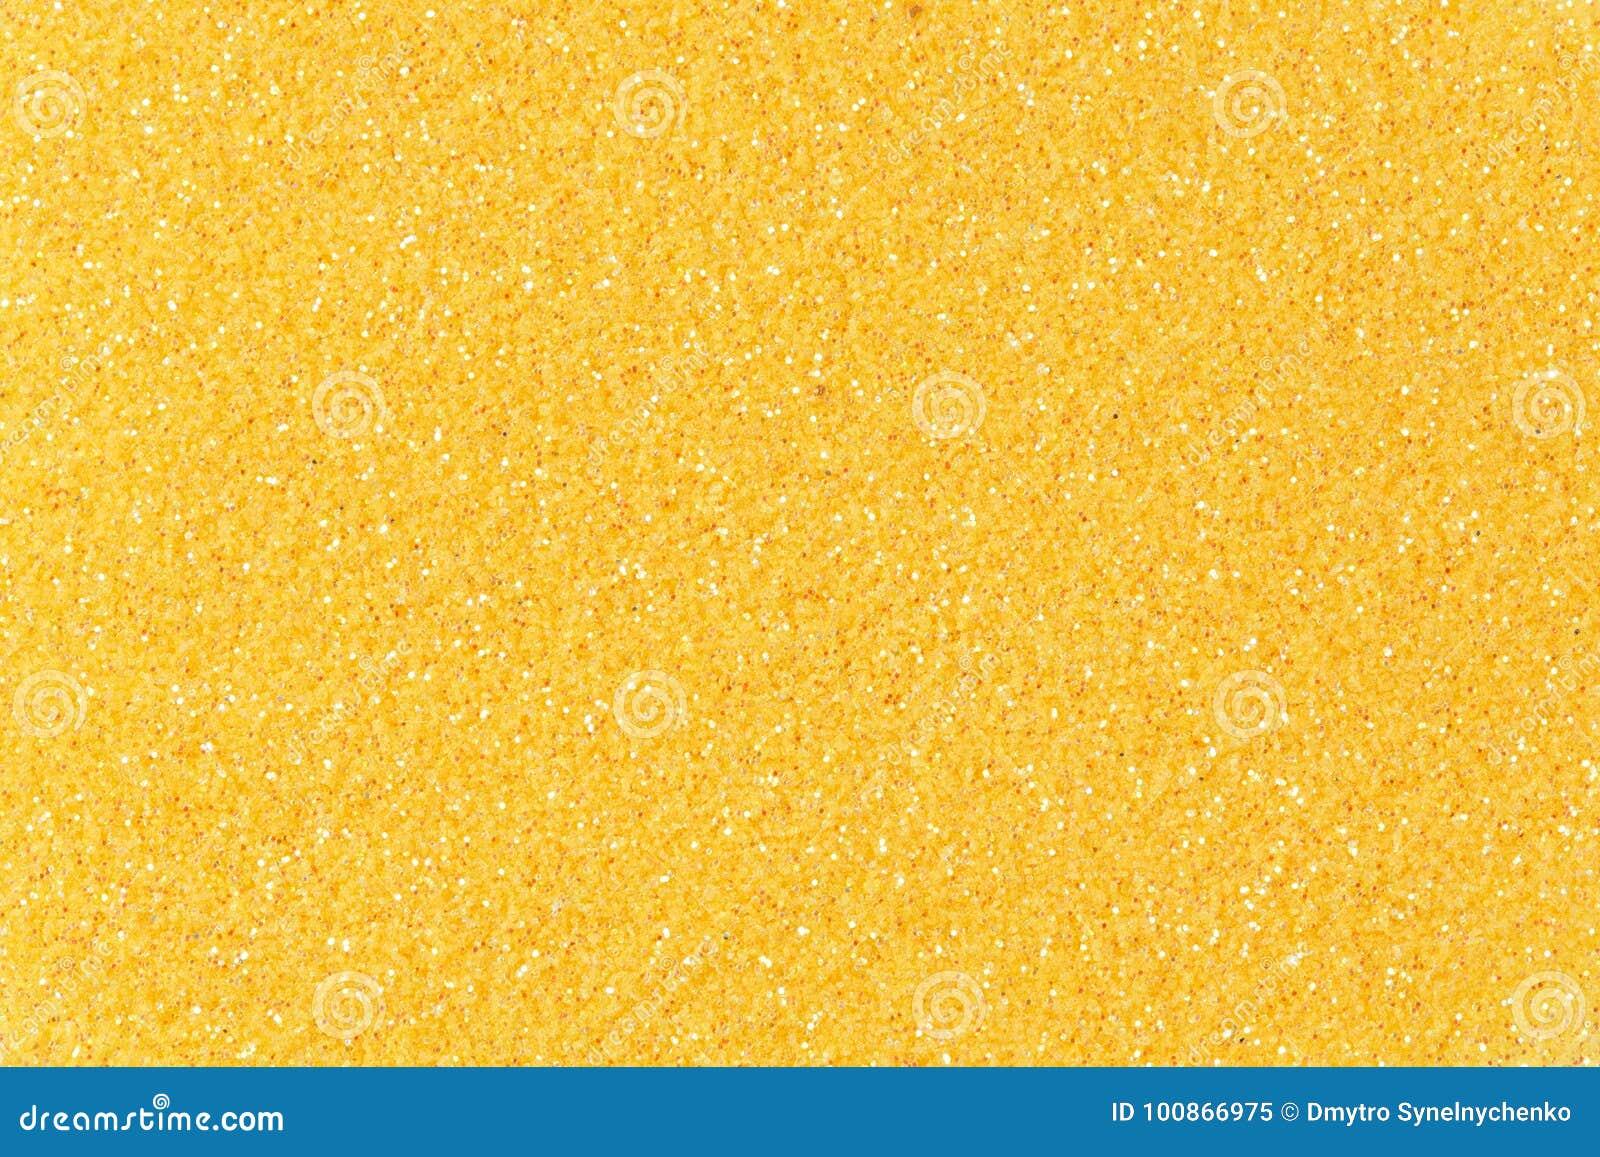 Abstract Light Orange Glitter Background Stock Image